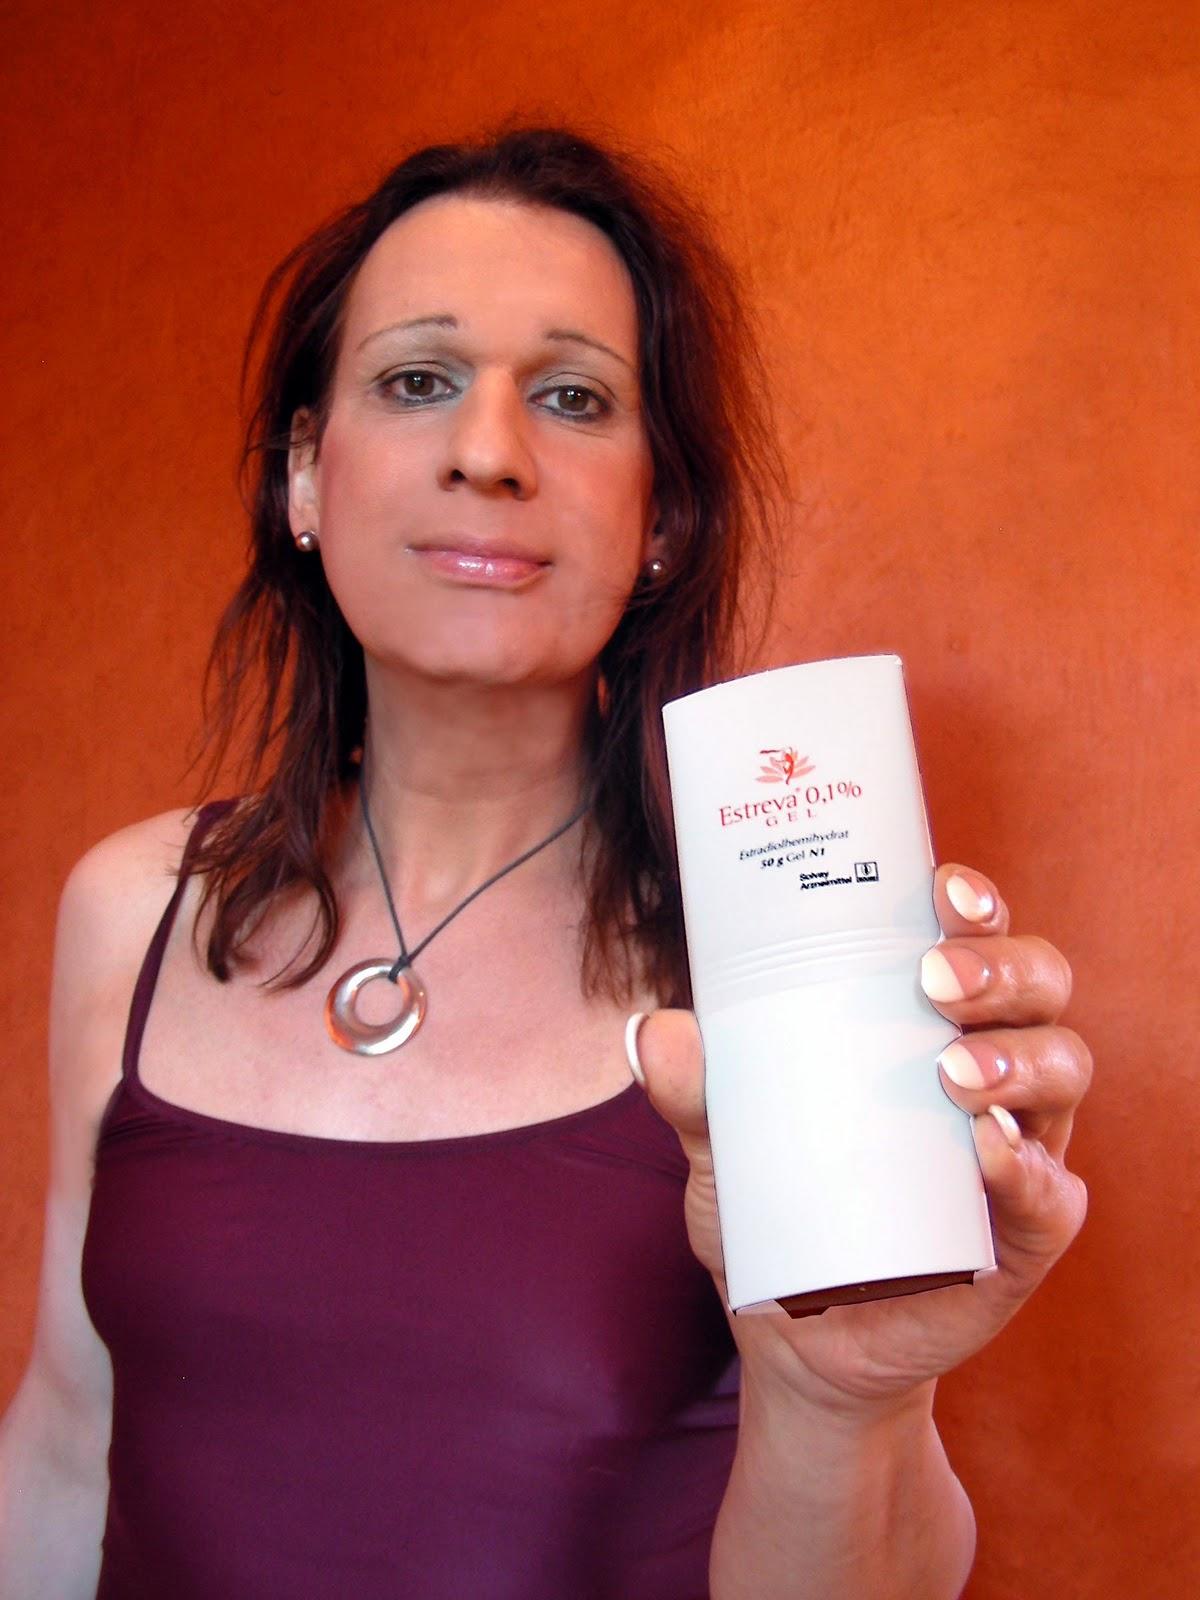 Looks like a beauty product: Estreva gel